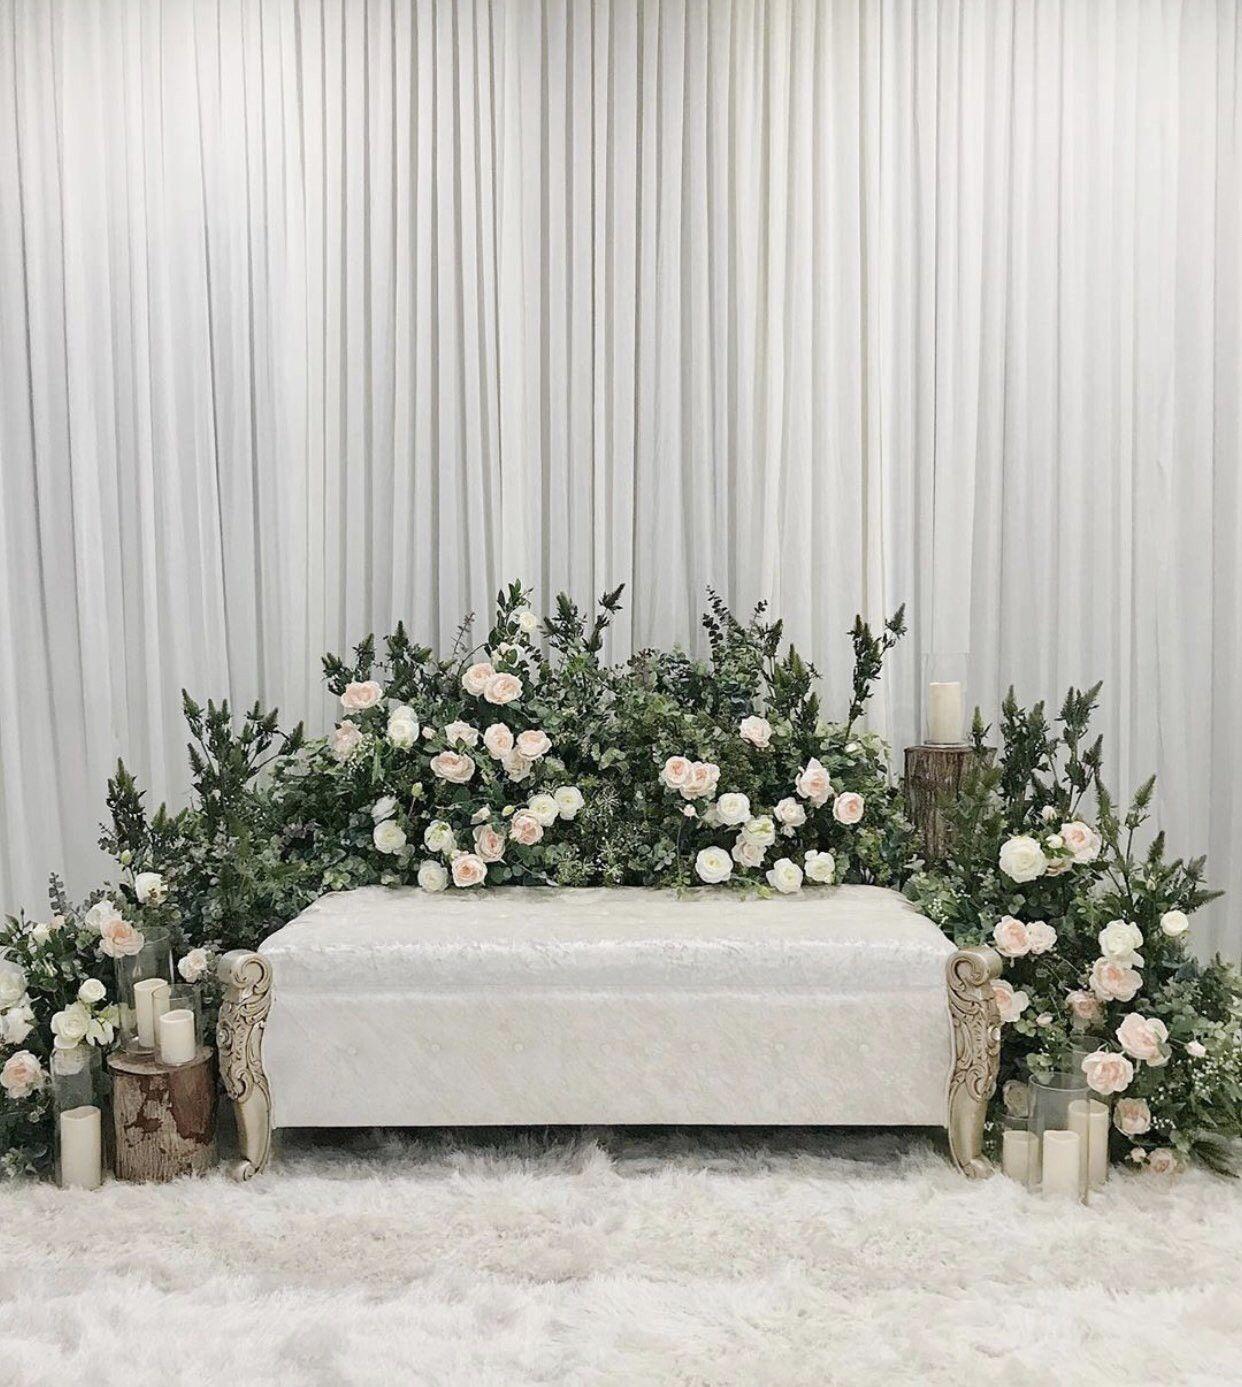 Pelamin Simple Wedding Planning Decor Dream Wedding Decorations Wedding Stage Decorations